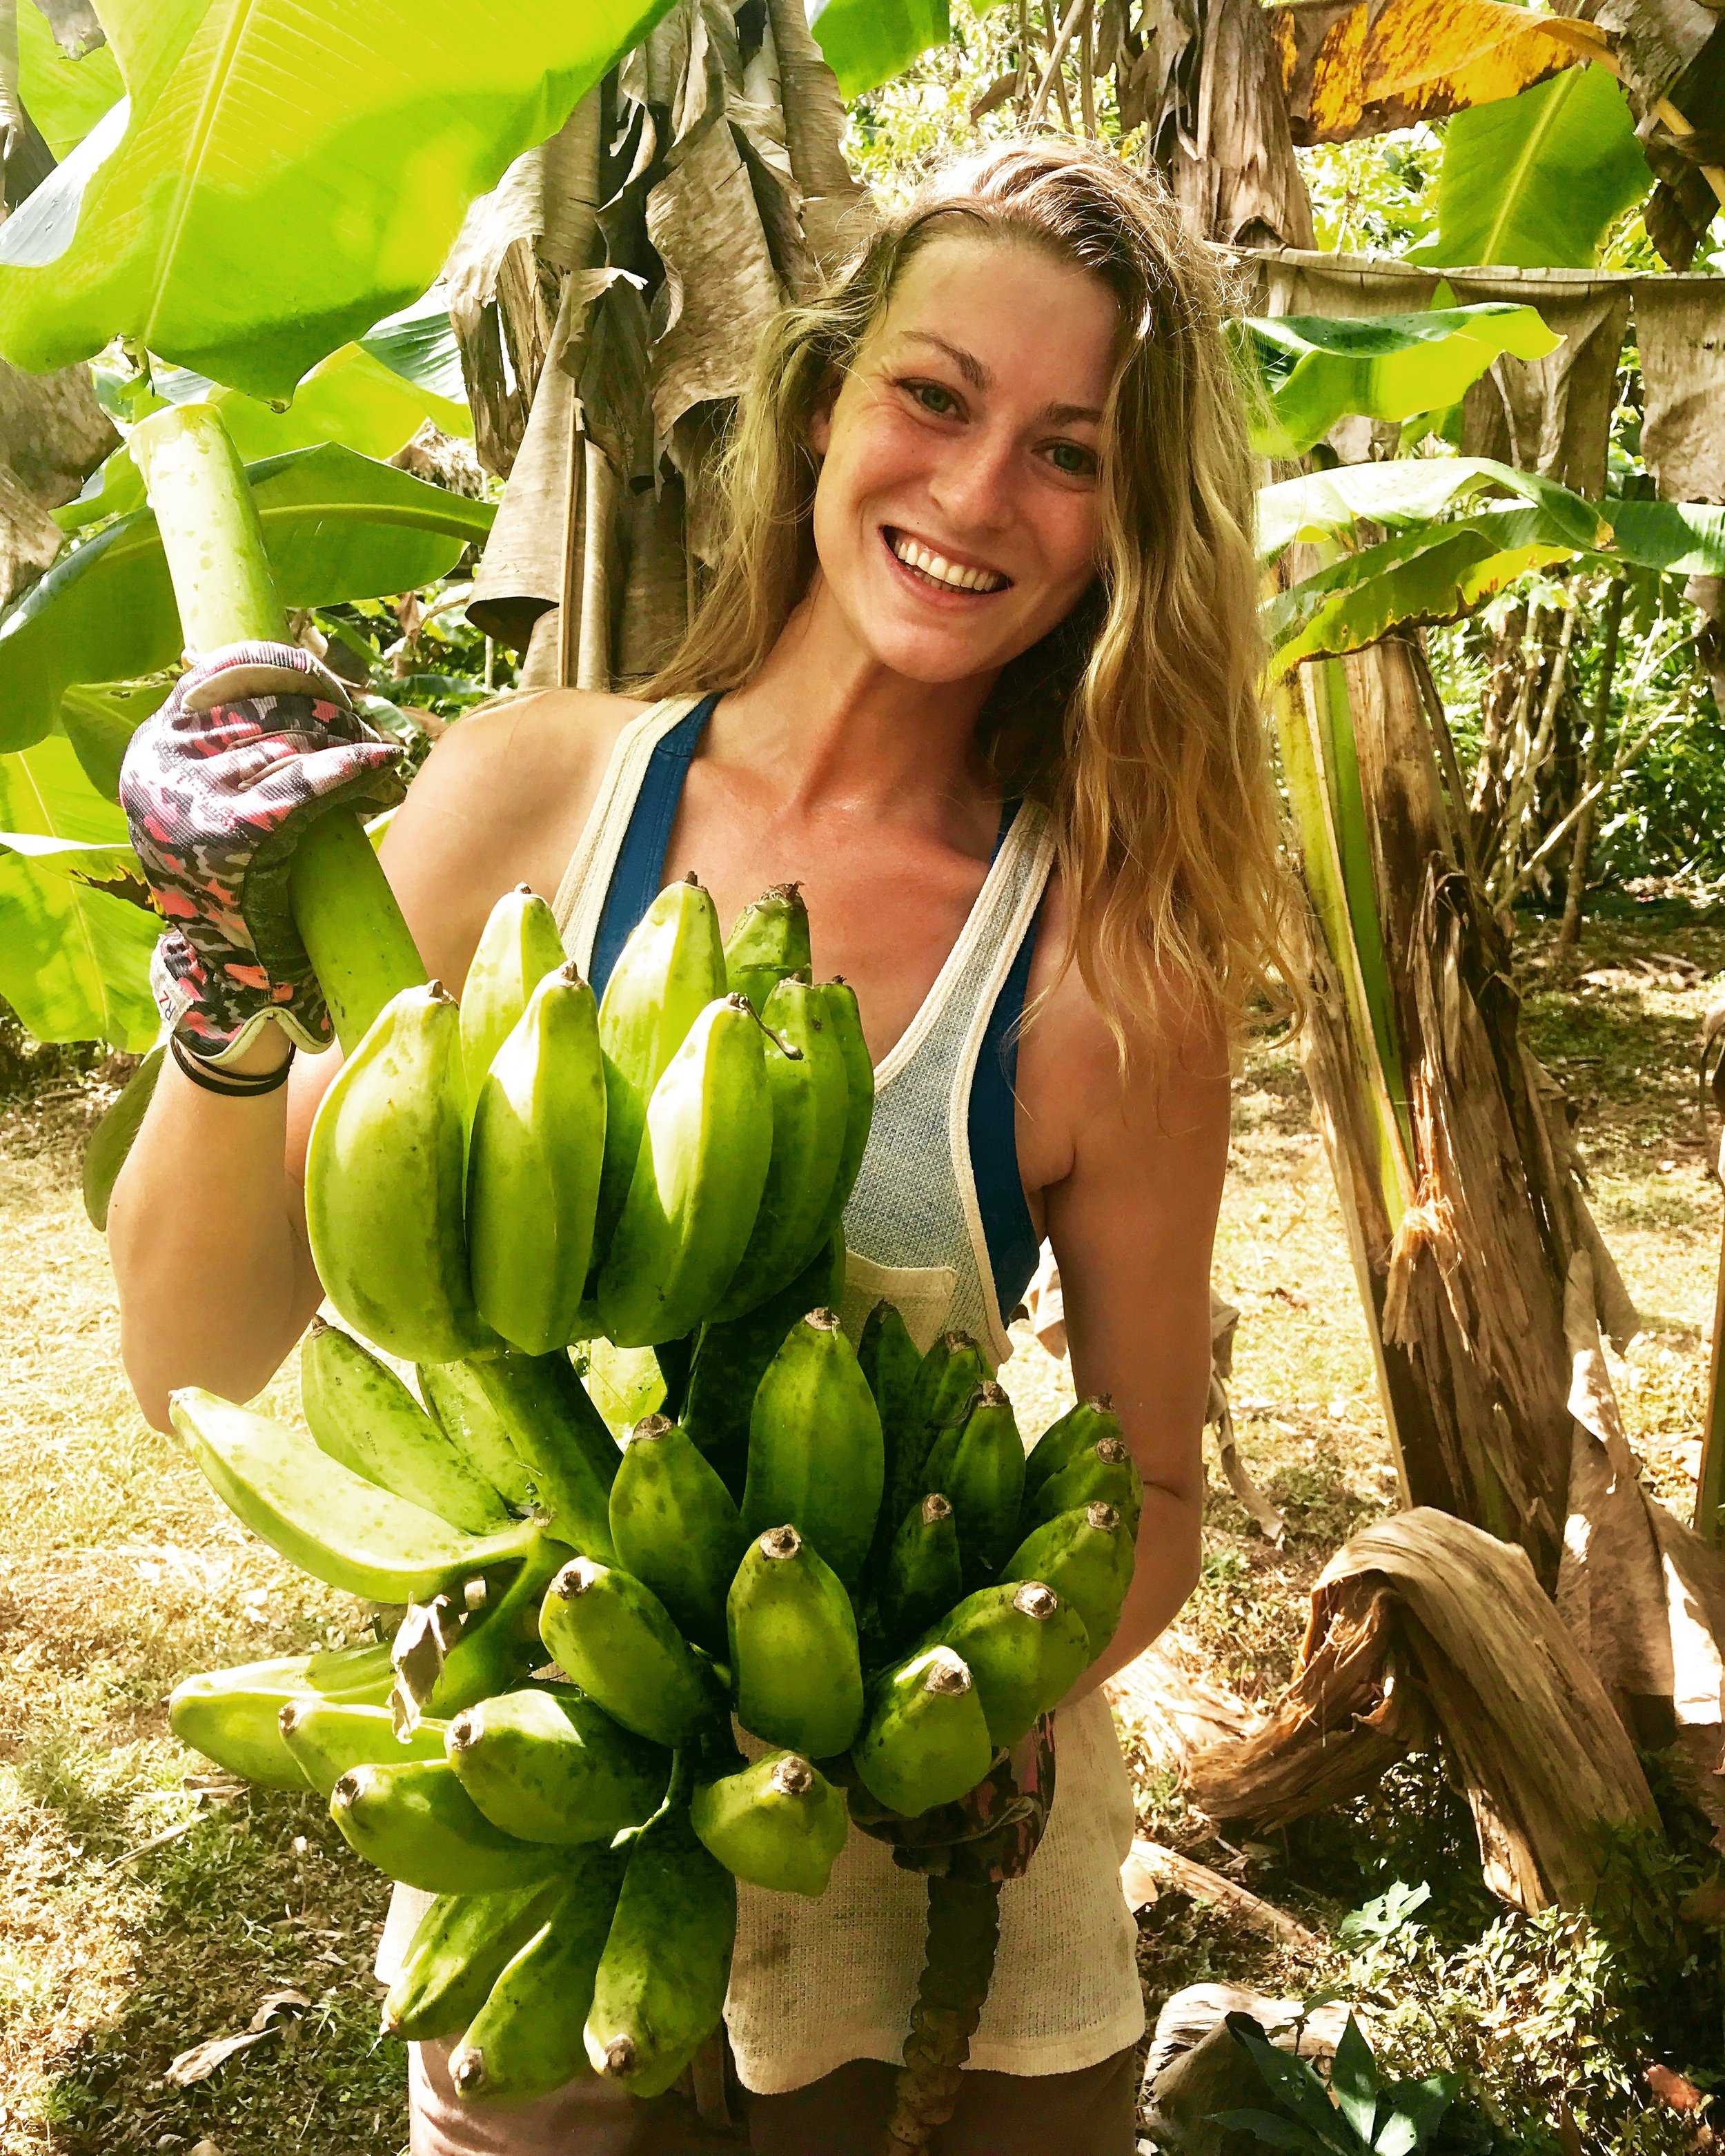 farm zoe bananas.JPG